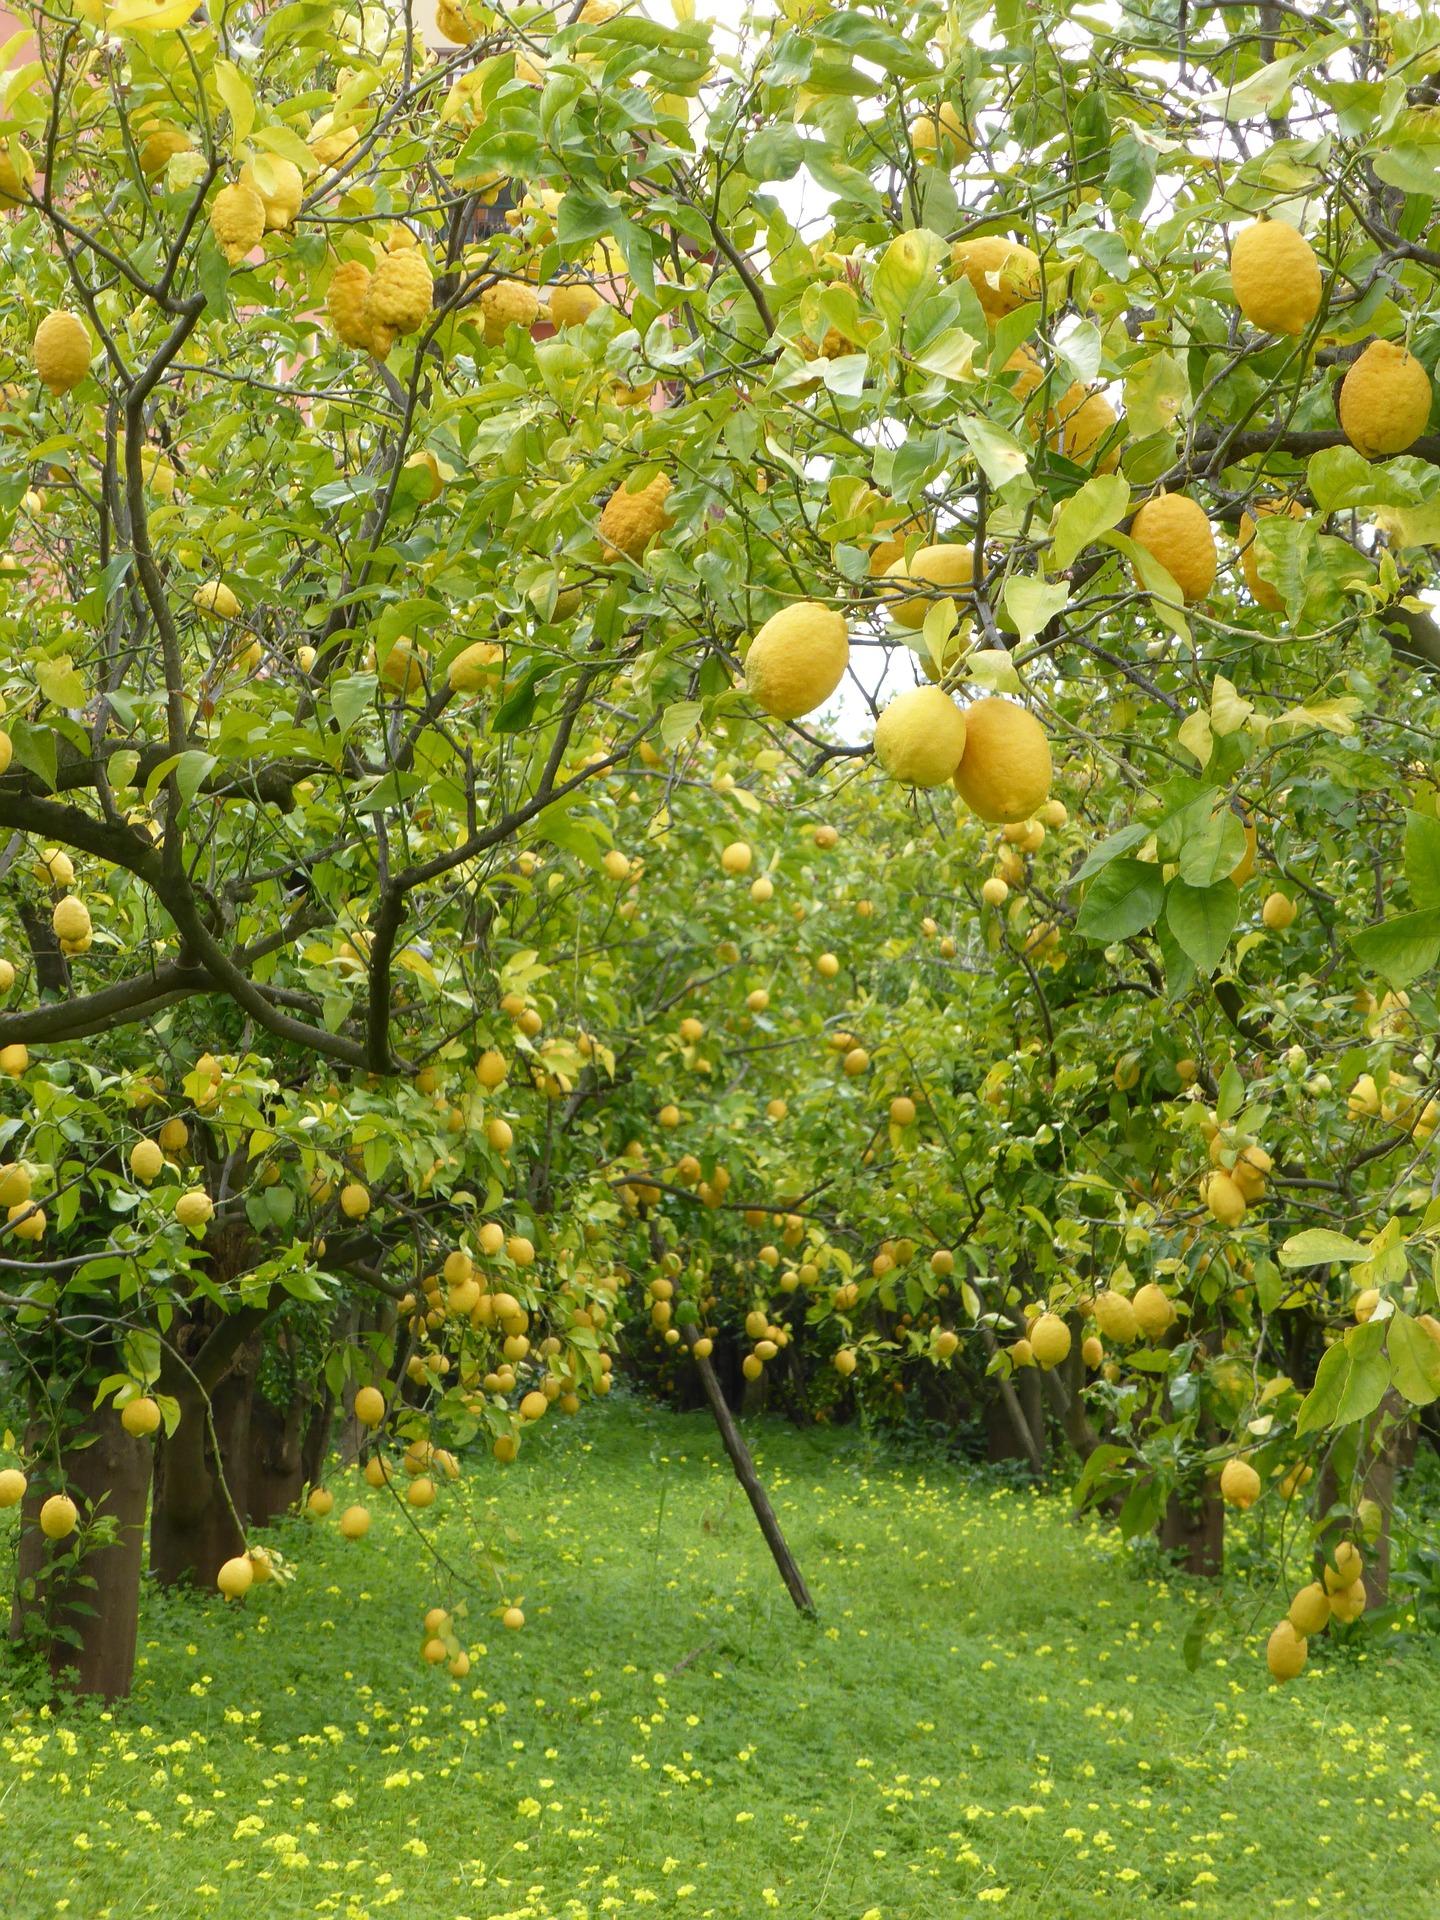 Lemon trees in Sorrento Italy